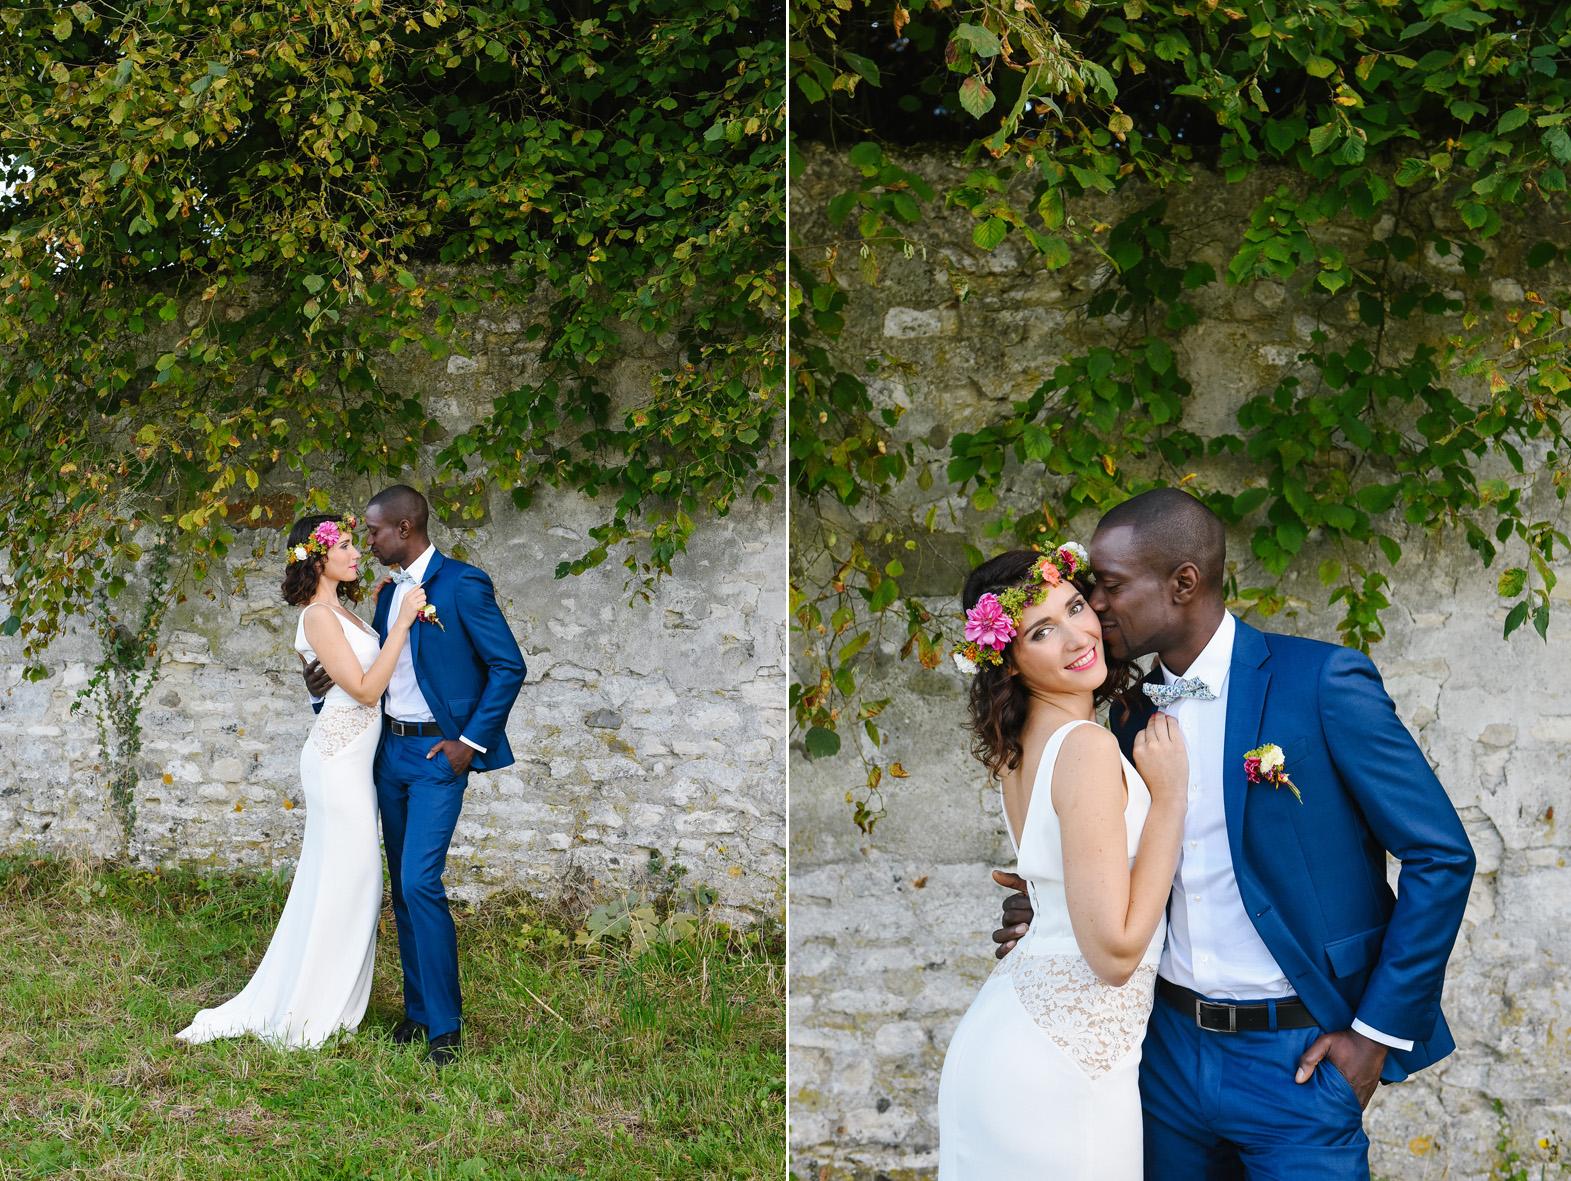 shooting_inspiration_mariage_peps_wedding_95_photographe_clemence_dubois-mep14